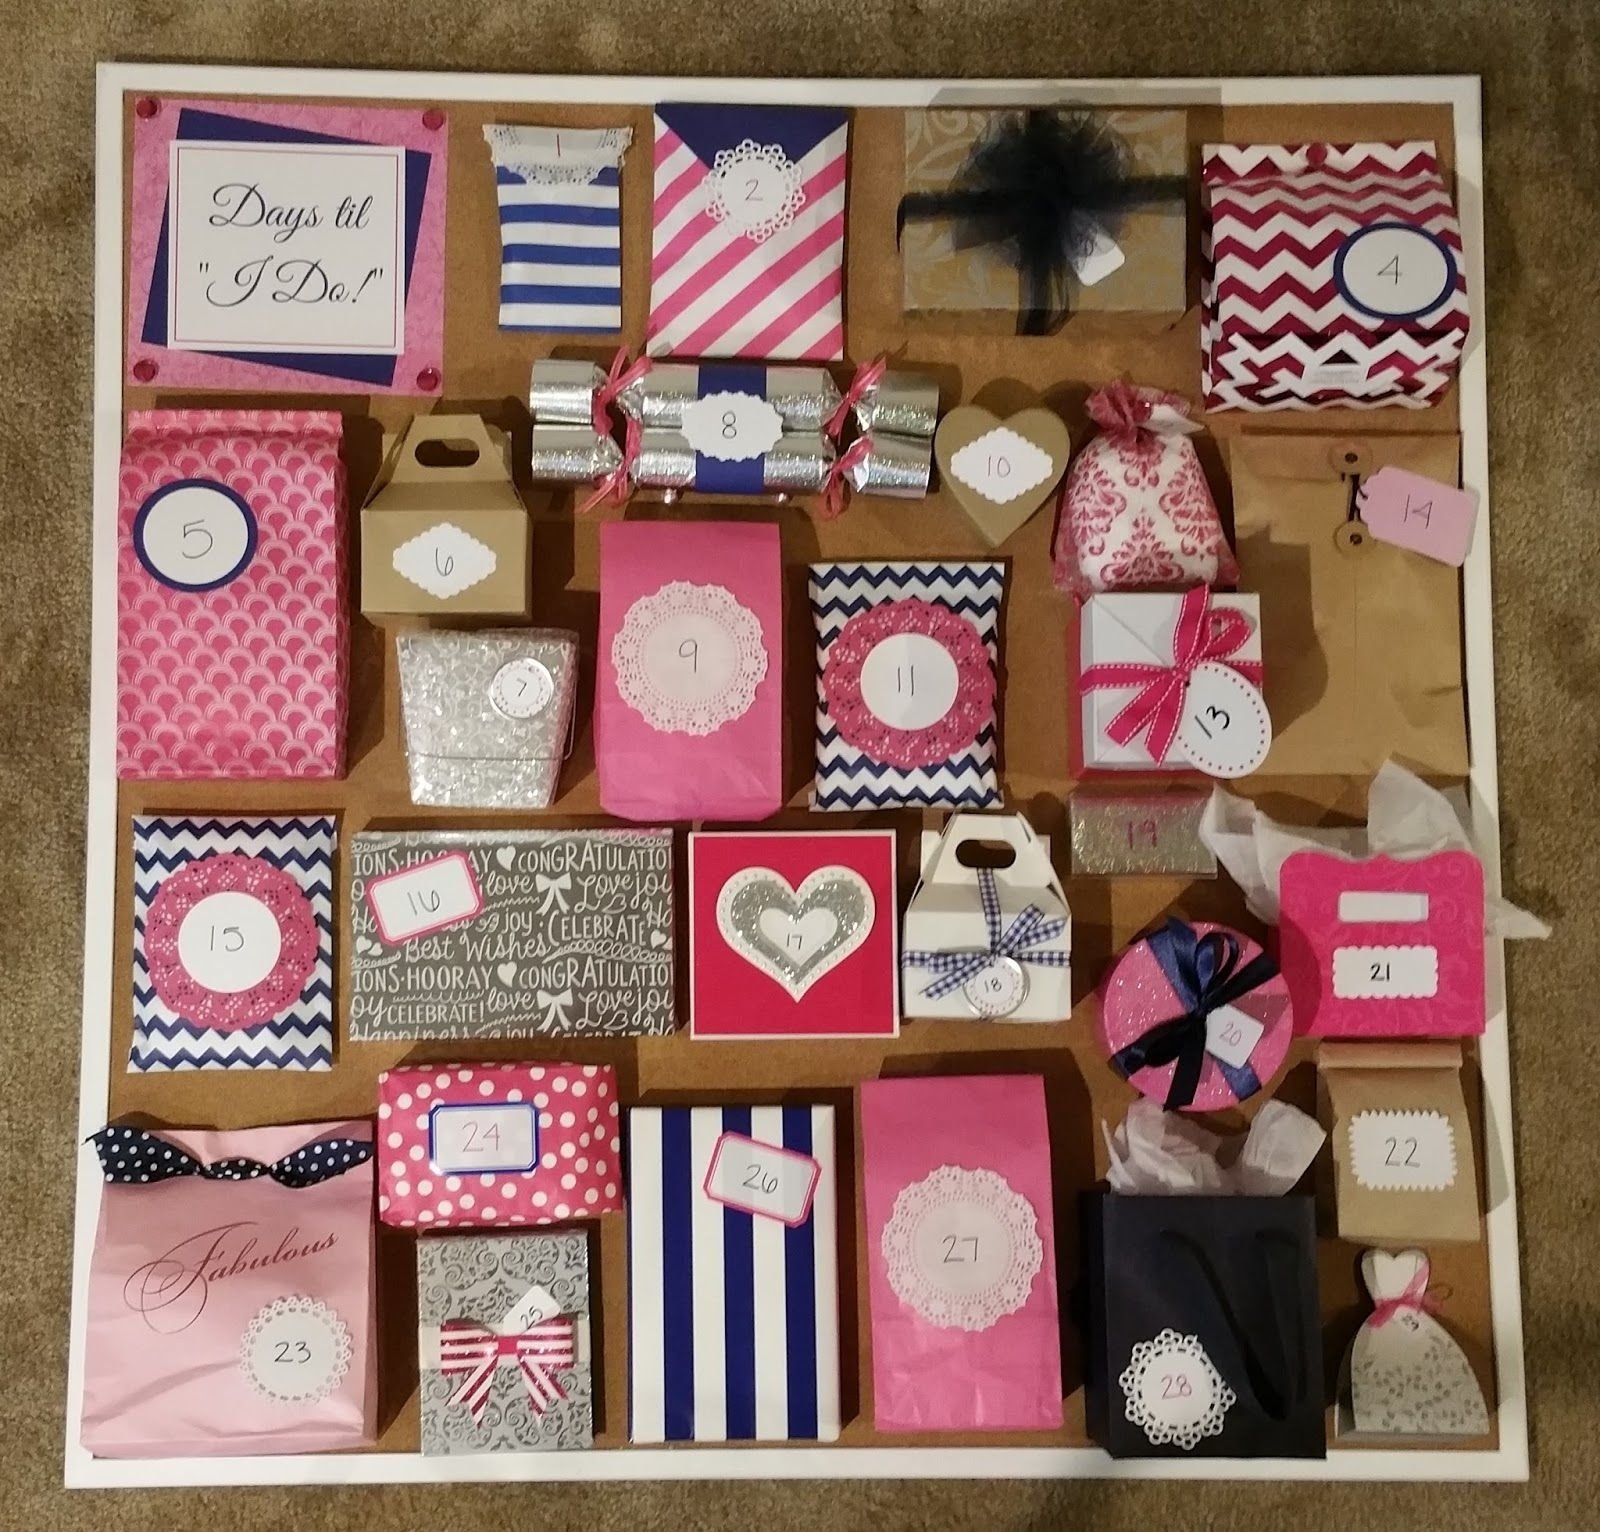 10 Trendy Gift Idea For Sister In Law wedding advent calendar amandas wedding shower pinterest 1